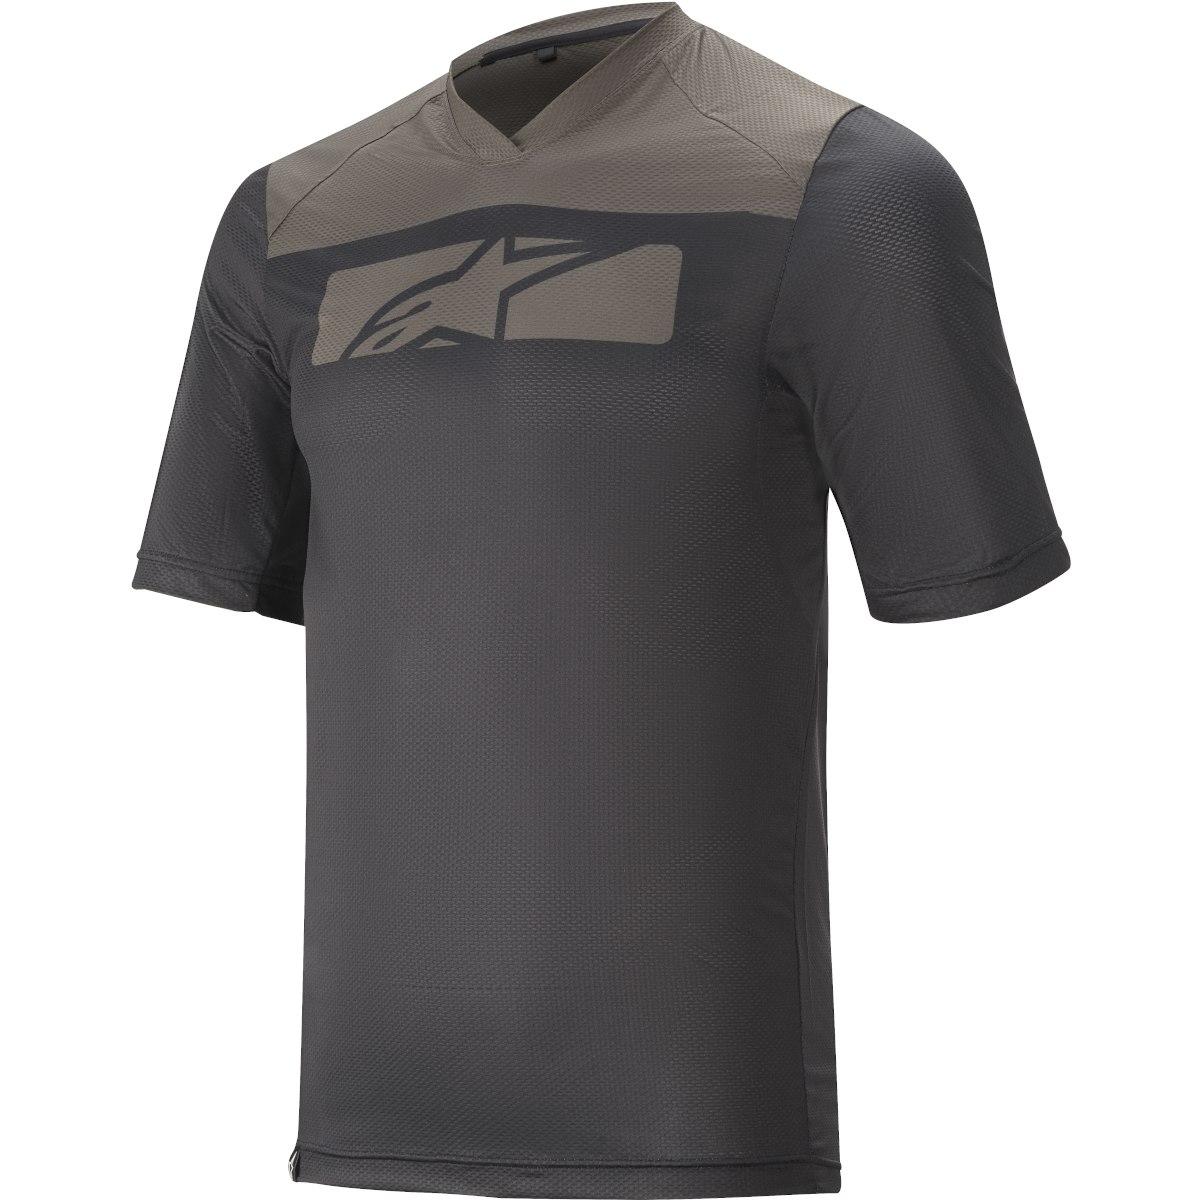 Alpinestars Drop 4.0 Short Sleeve Jersey - black/dark shadow